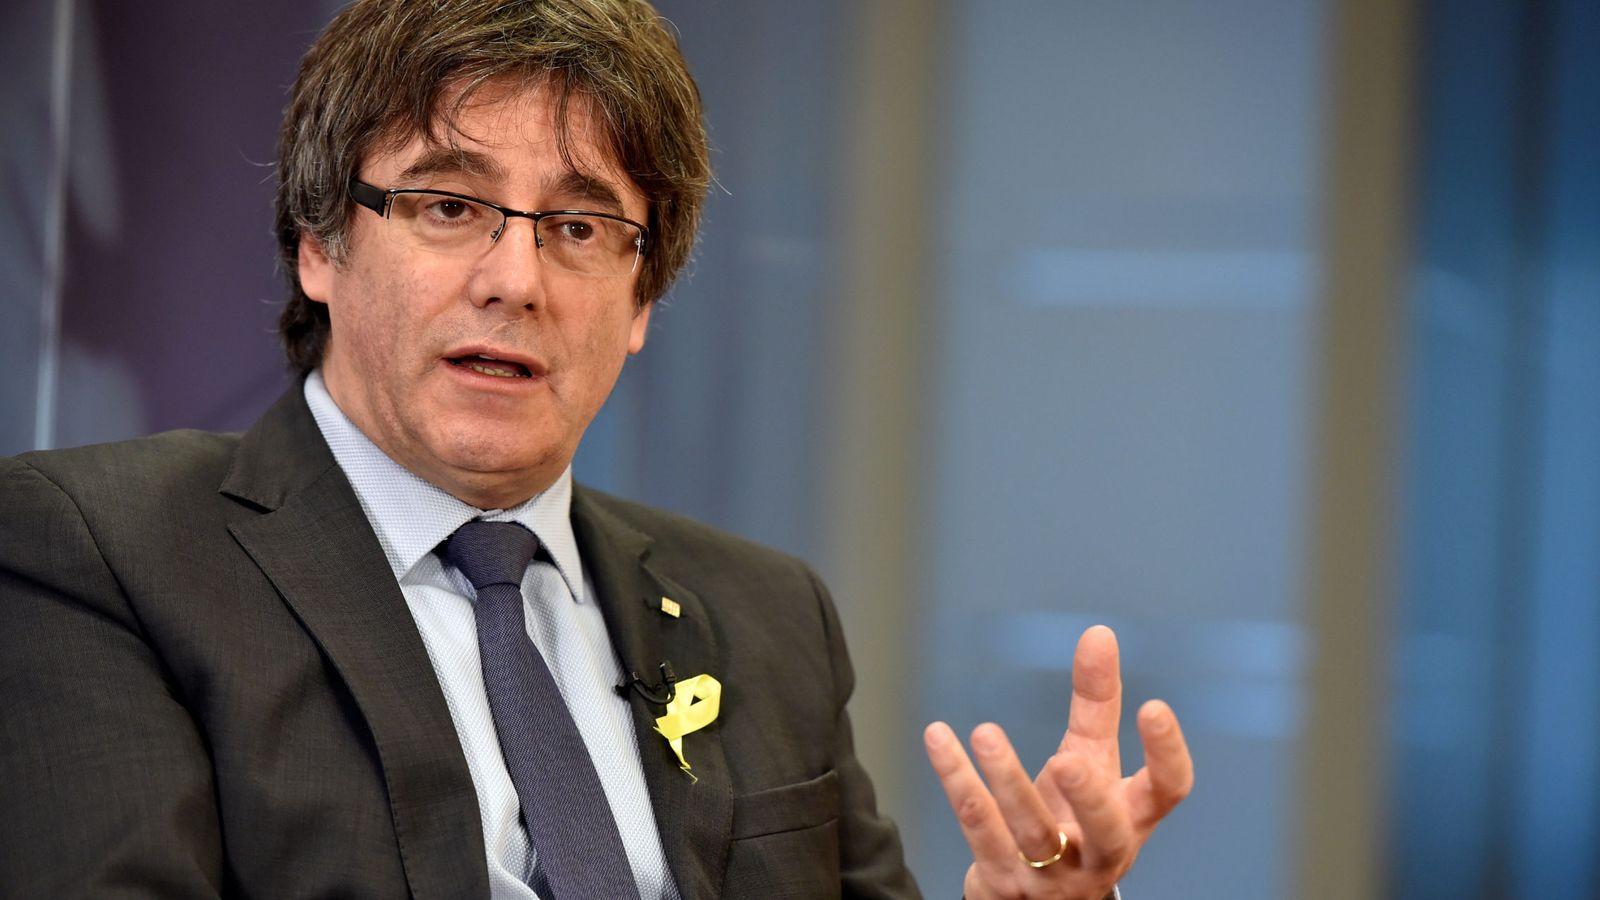 Foto: El 'expresident' de la Generalitat Carles Puigdemont, durante una entrevista. (EFE)